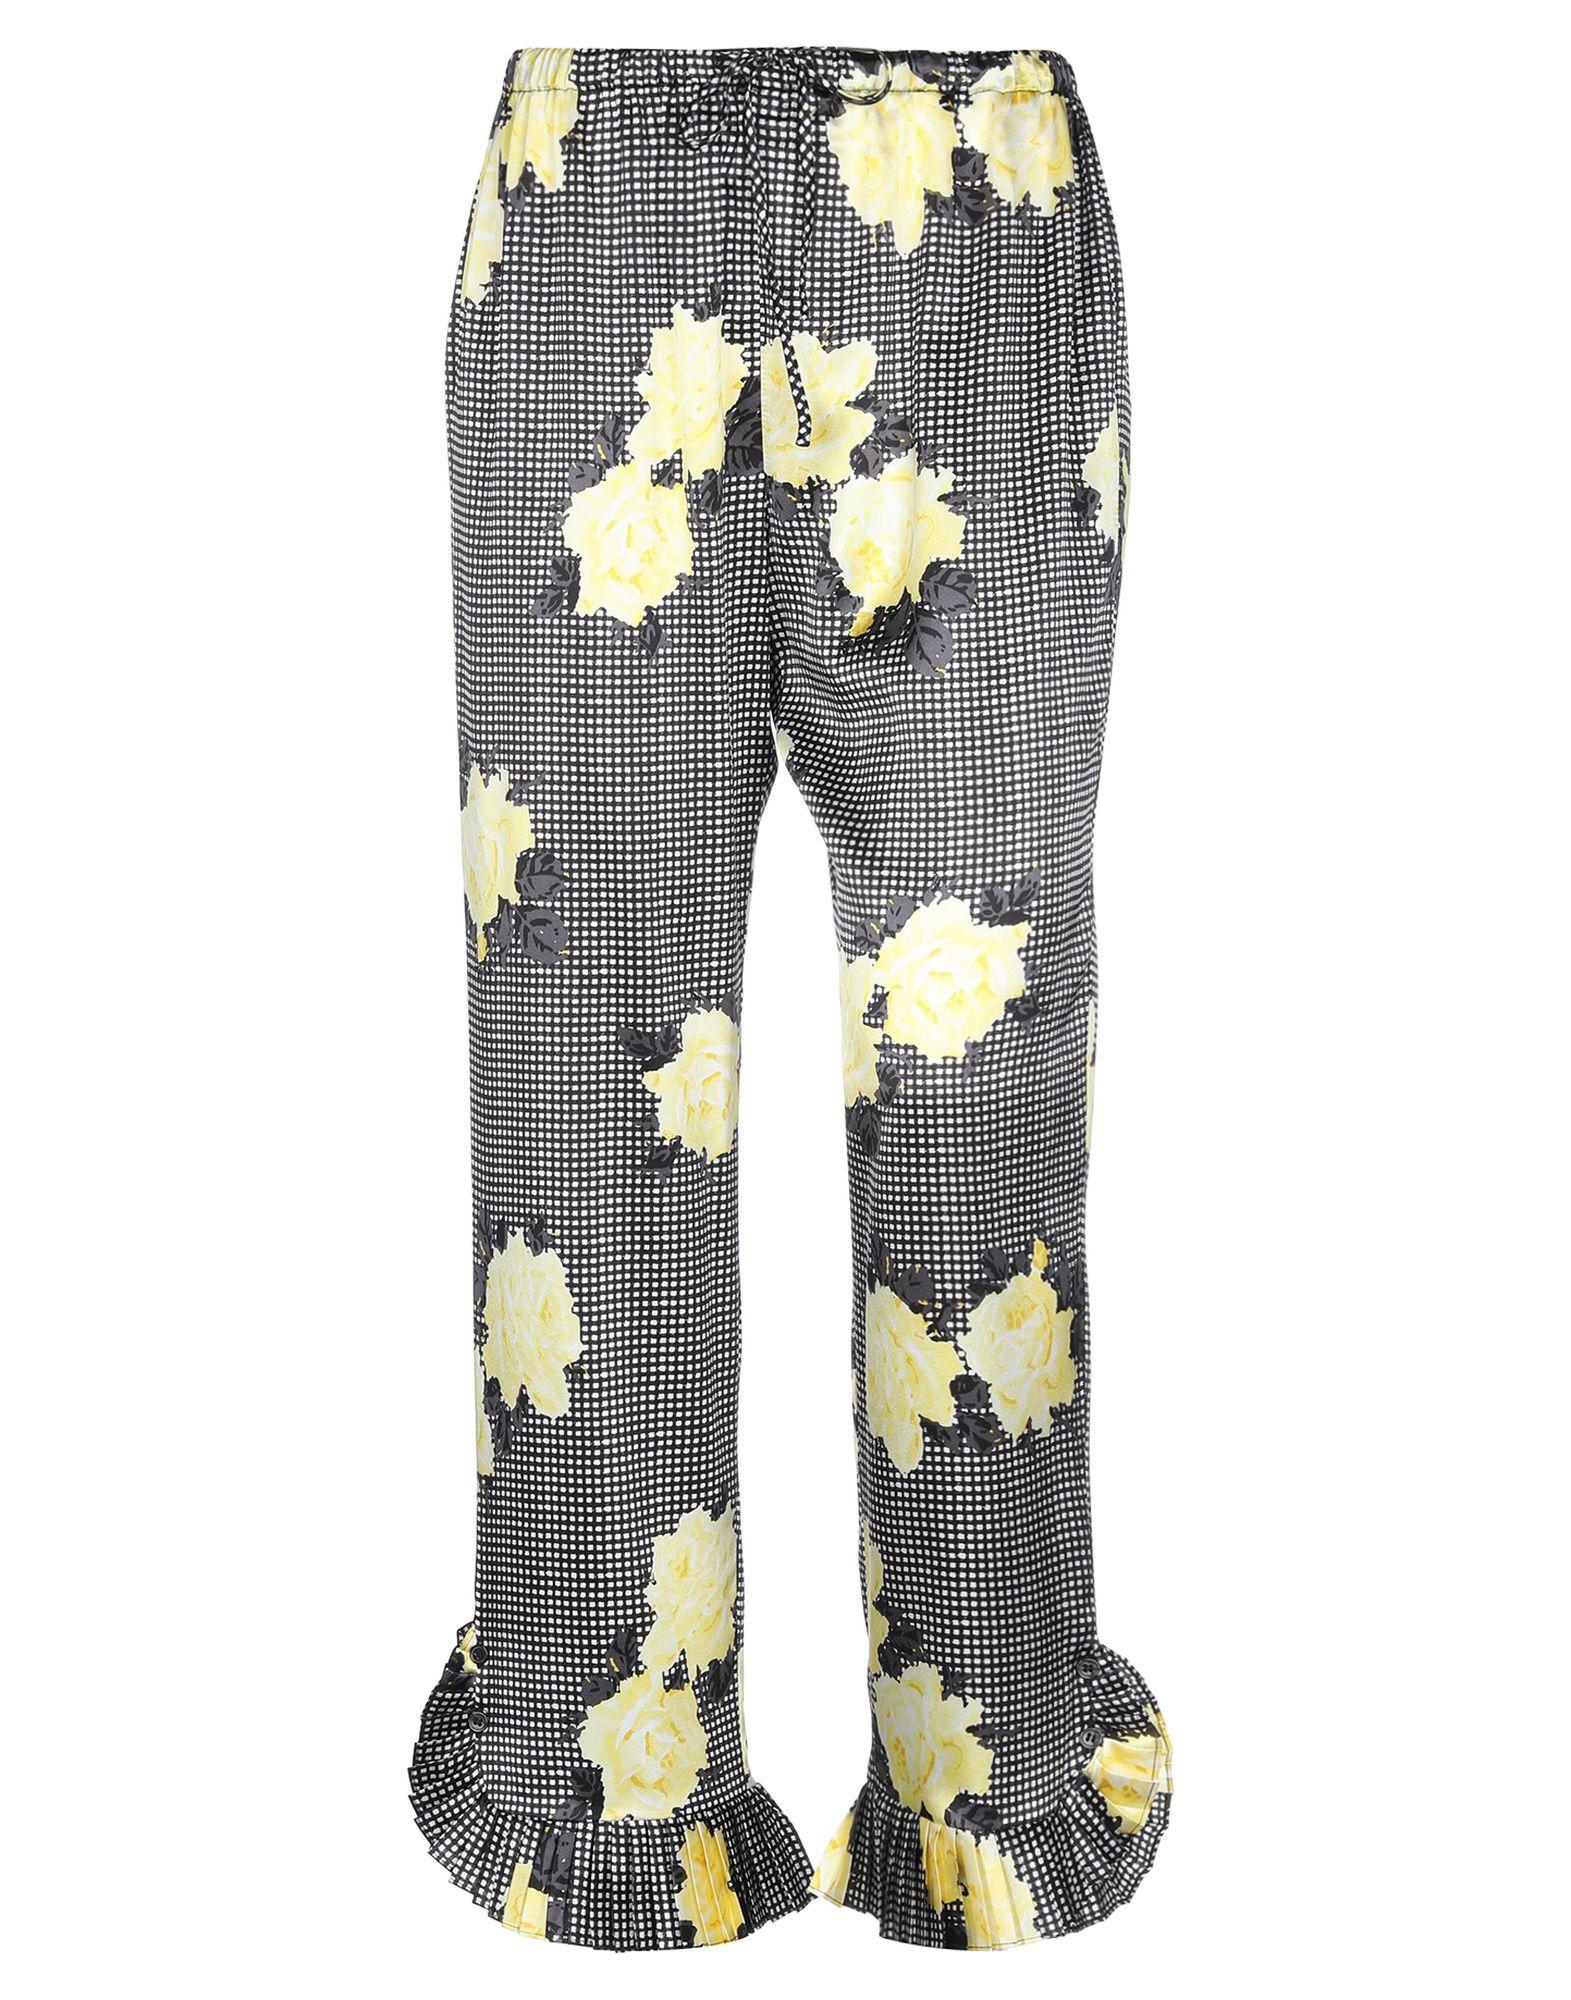 GANNI Casual pants. satin, no appliqués, floral design, high waisted, comfort fit, straight leg, drawstring closure, no pockets, stretch. 92% Silk, 8% Elastane